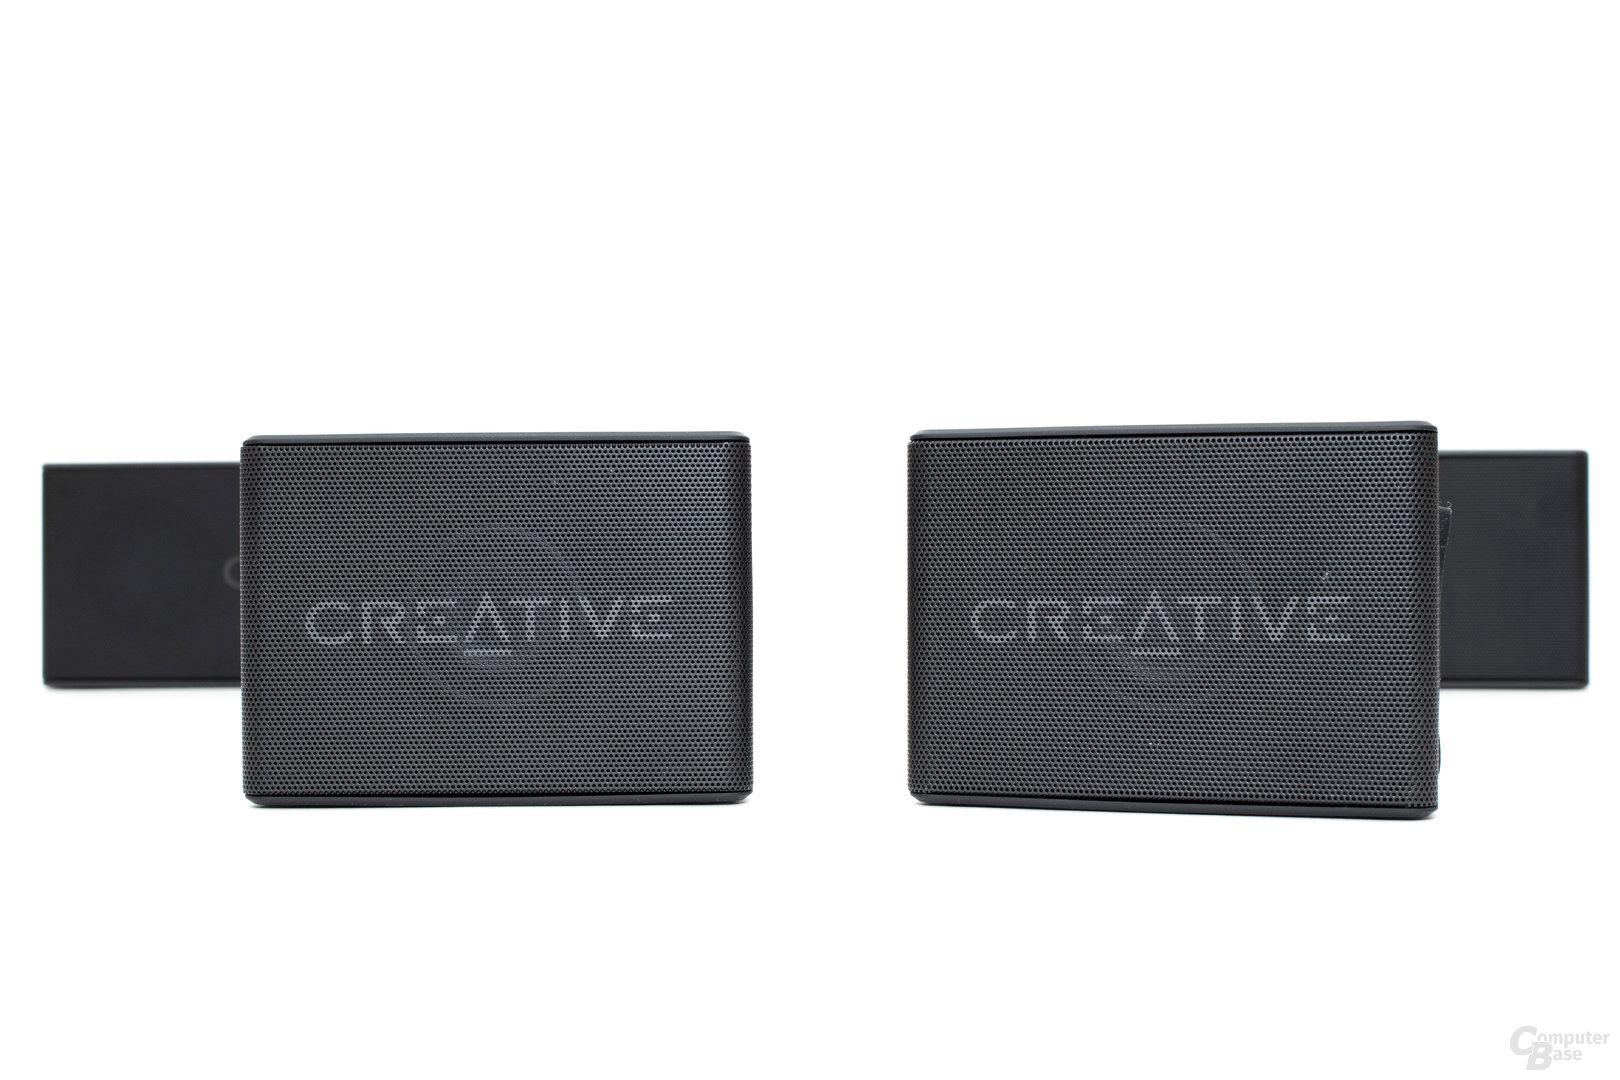 Creative MUVO 2 und MUVO 2c